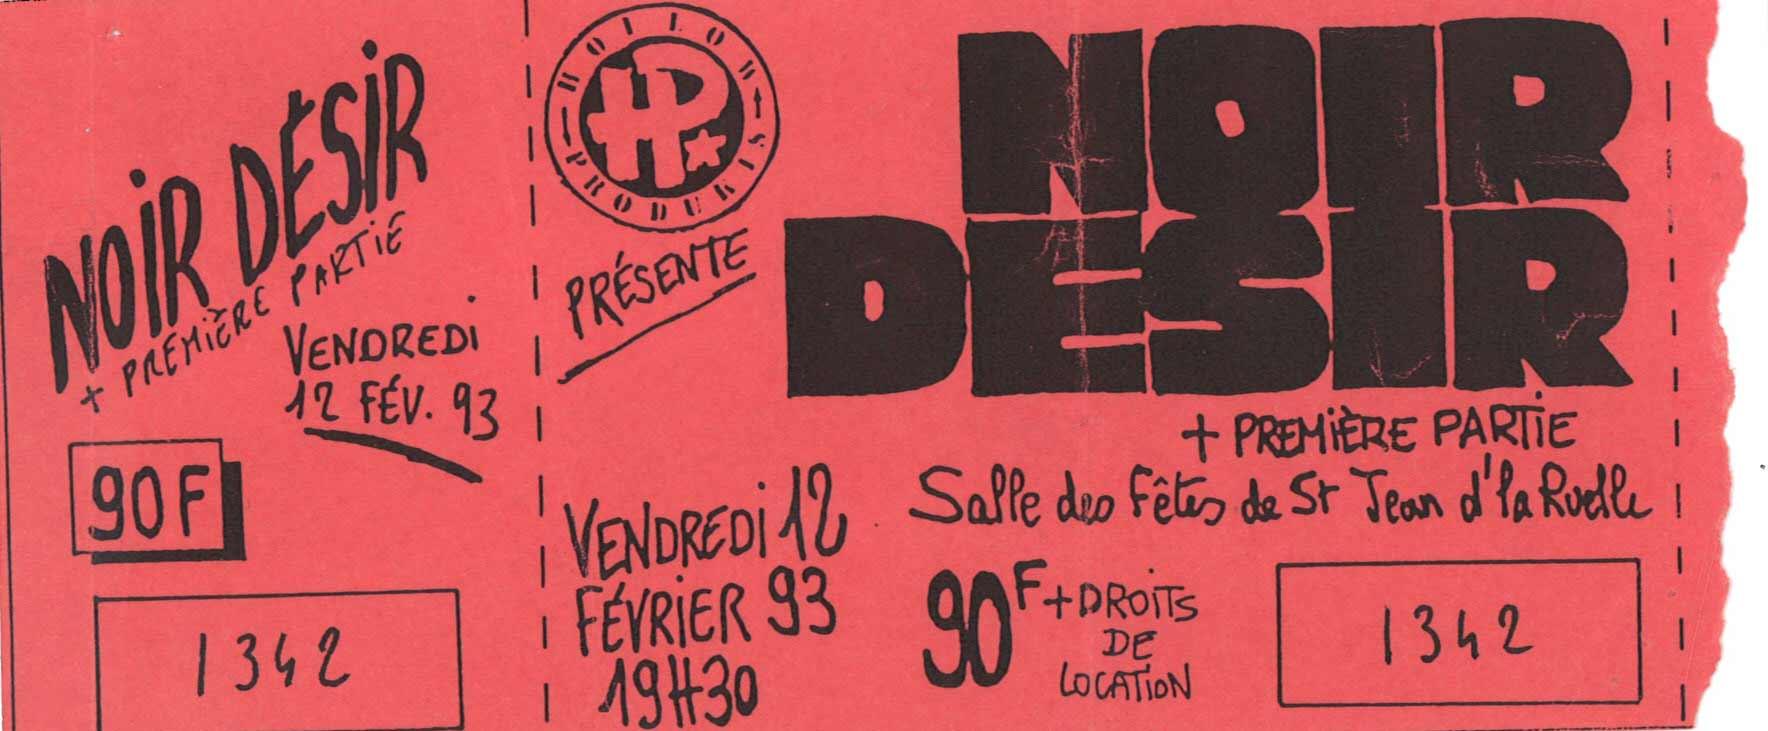 1993_02_12_ticket